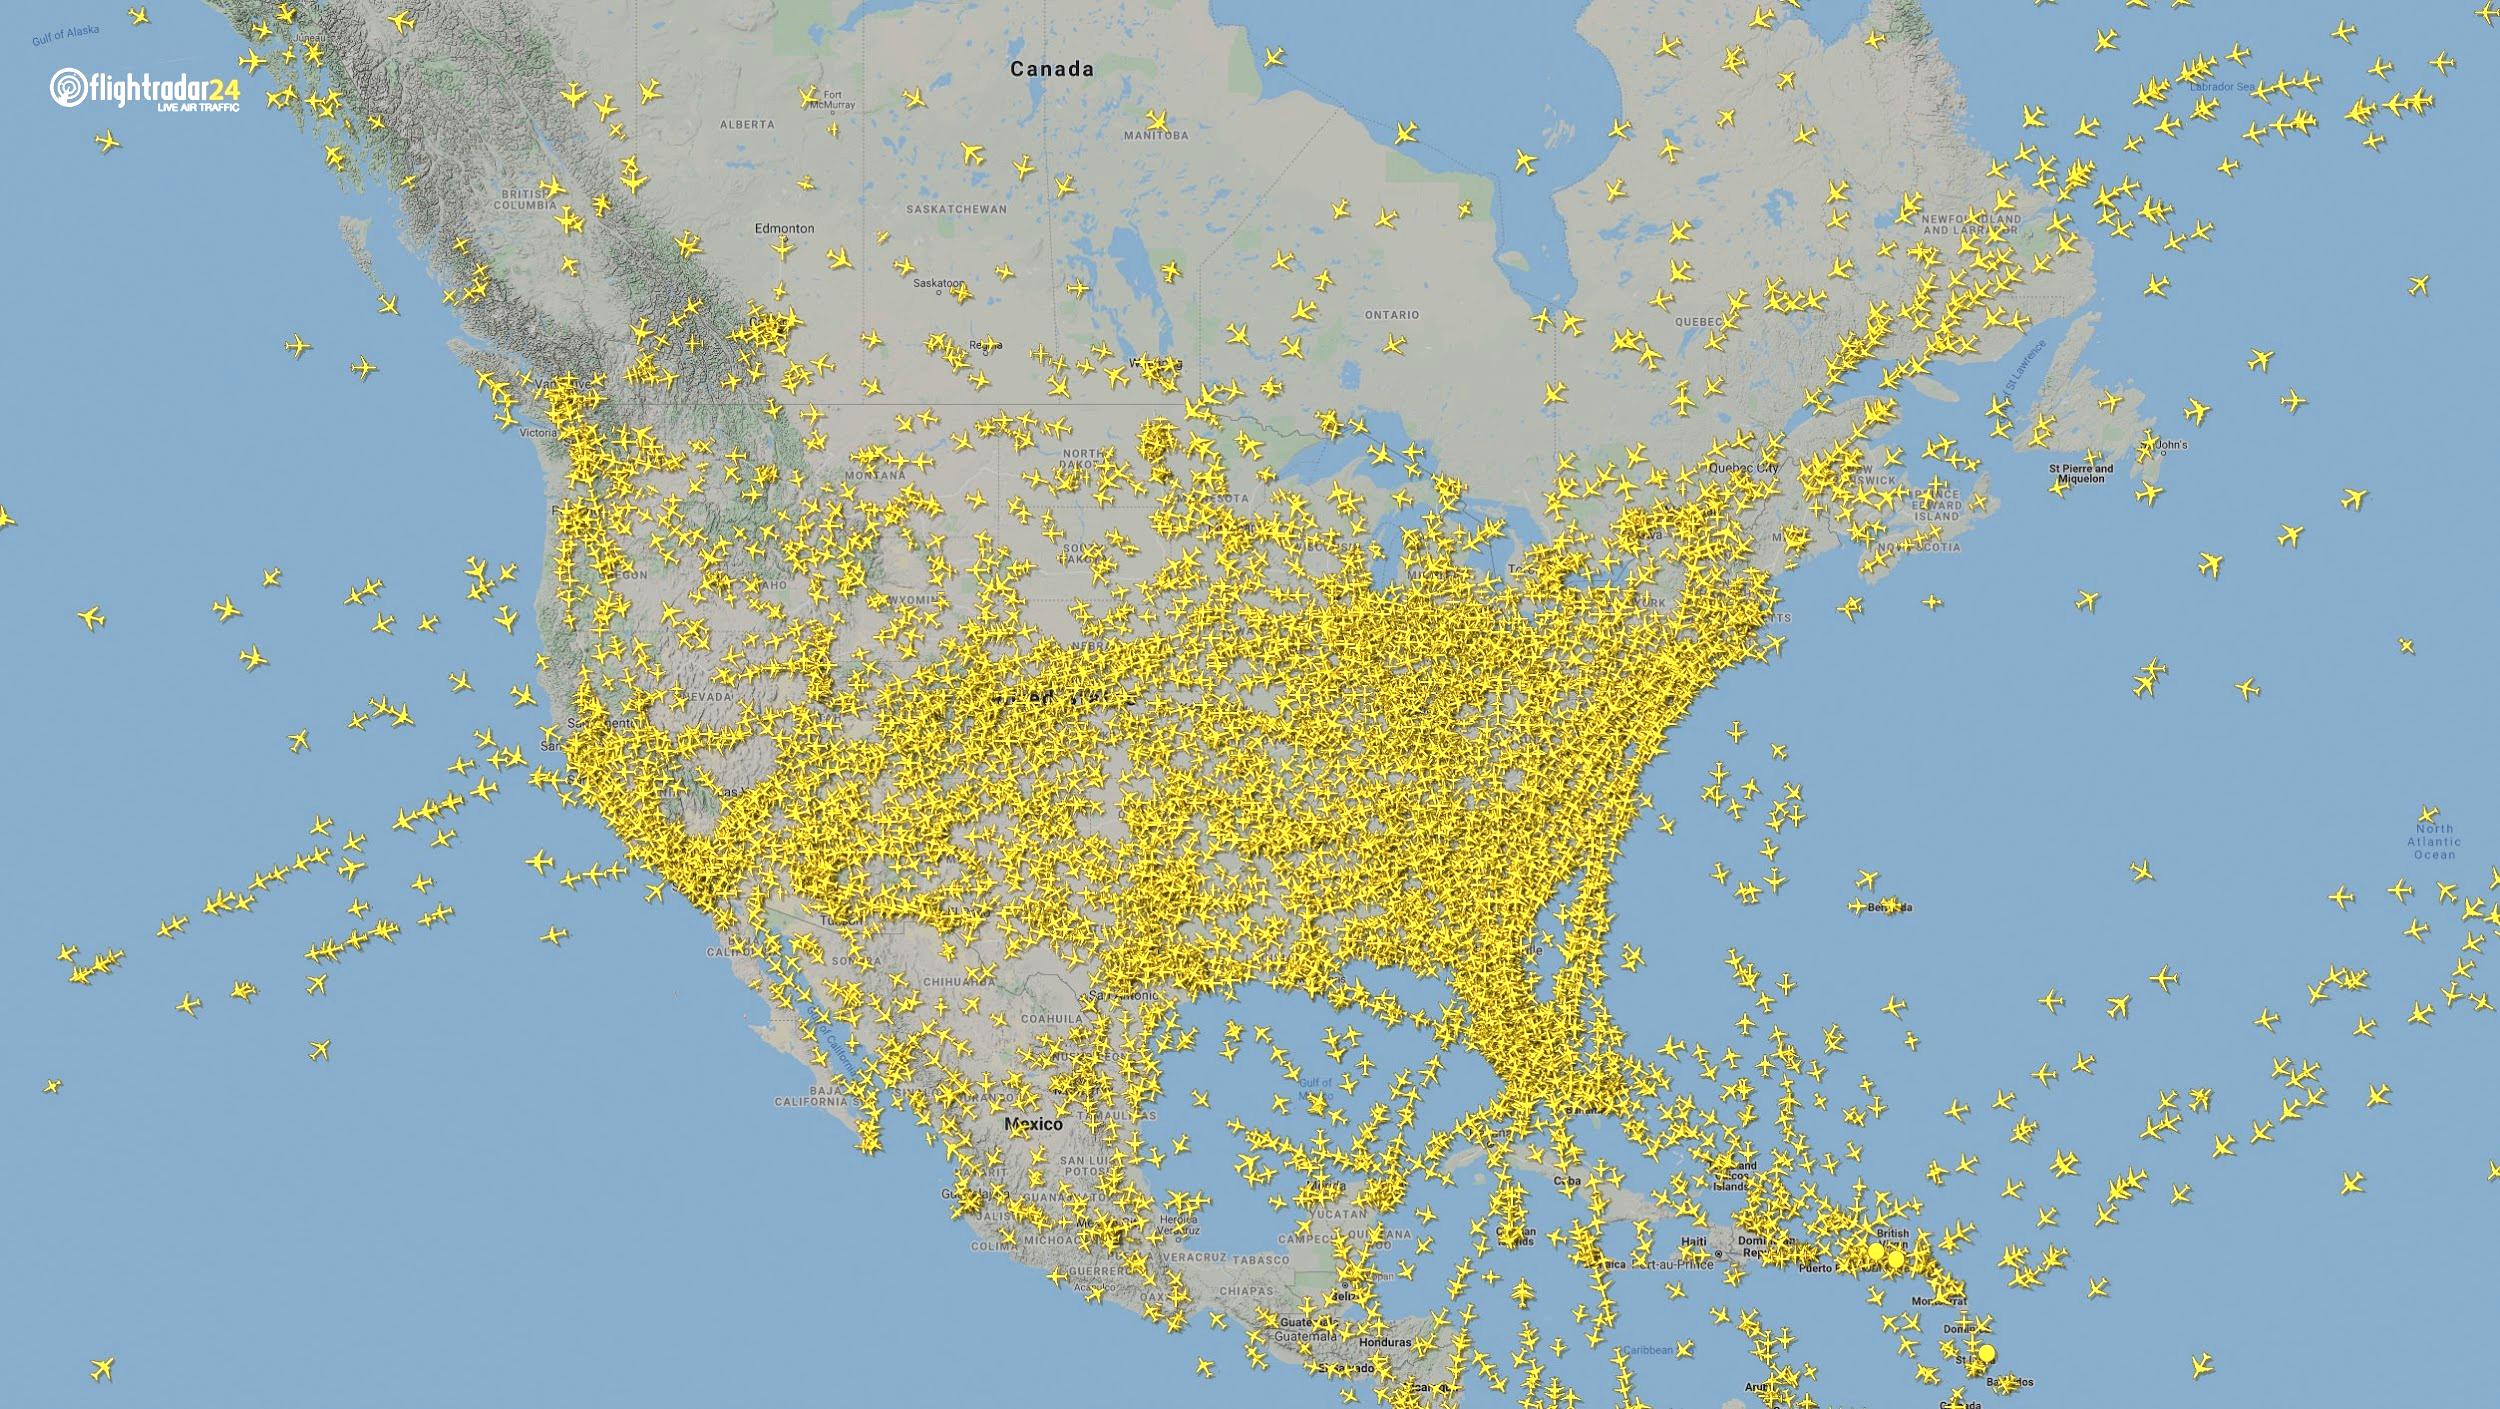 Air traffic over North America March 7, 2020. (Source: Flightradar24)